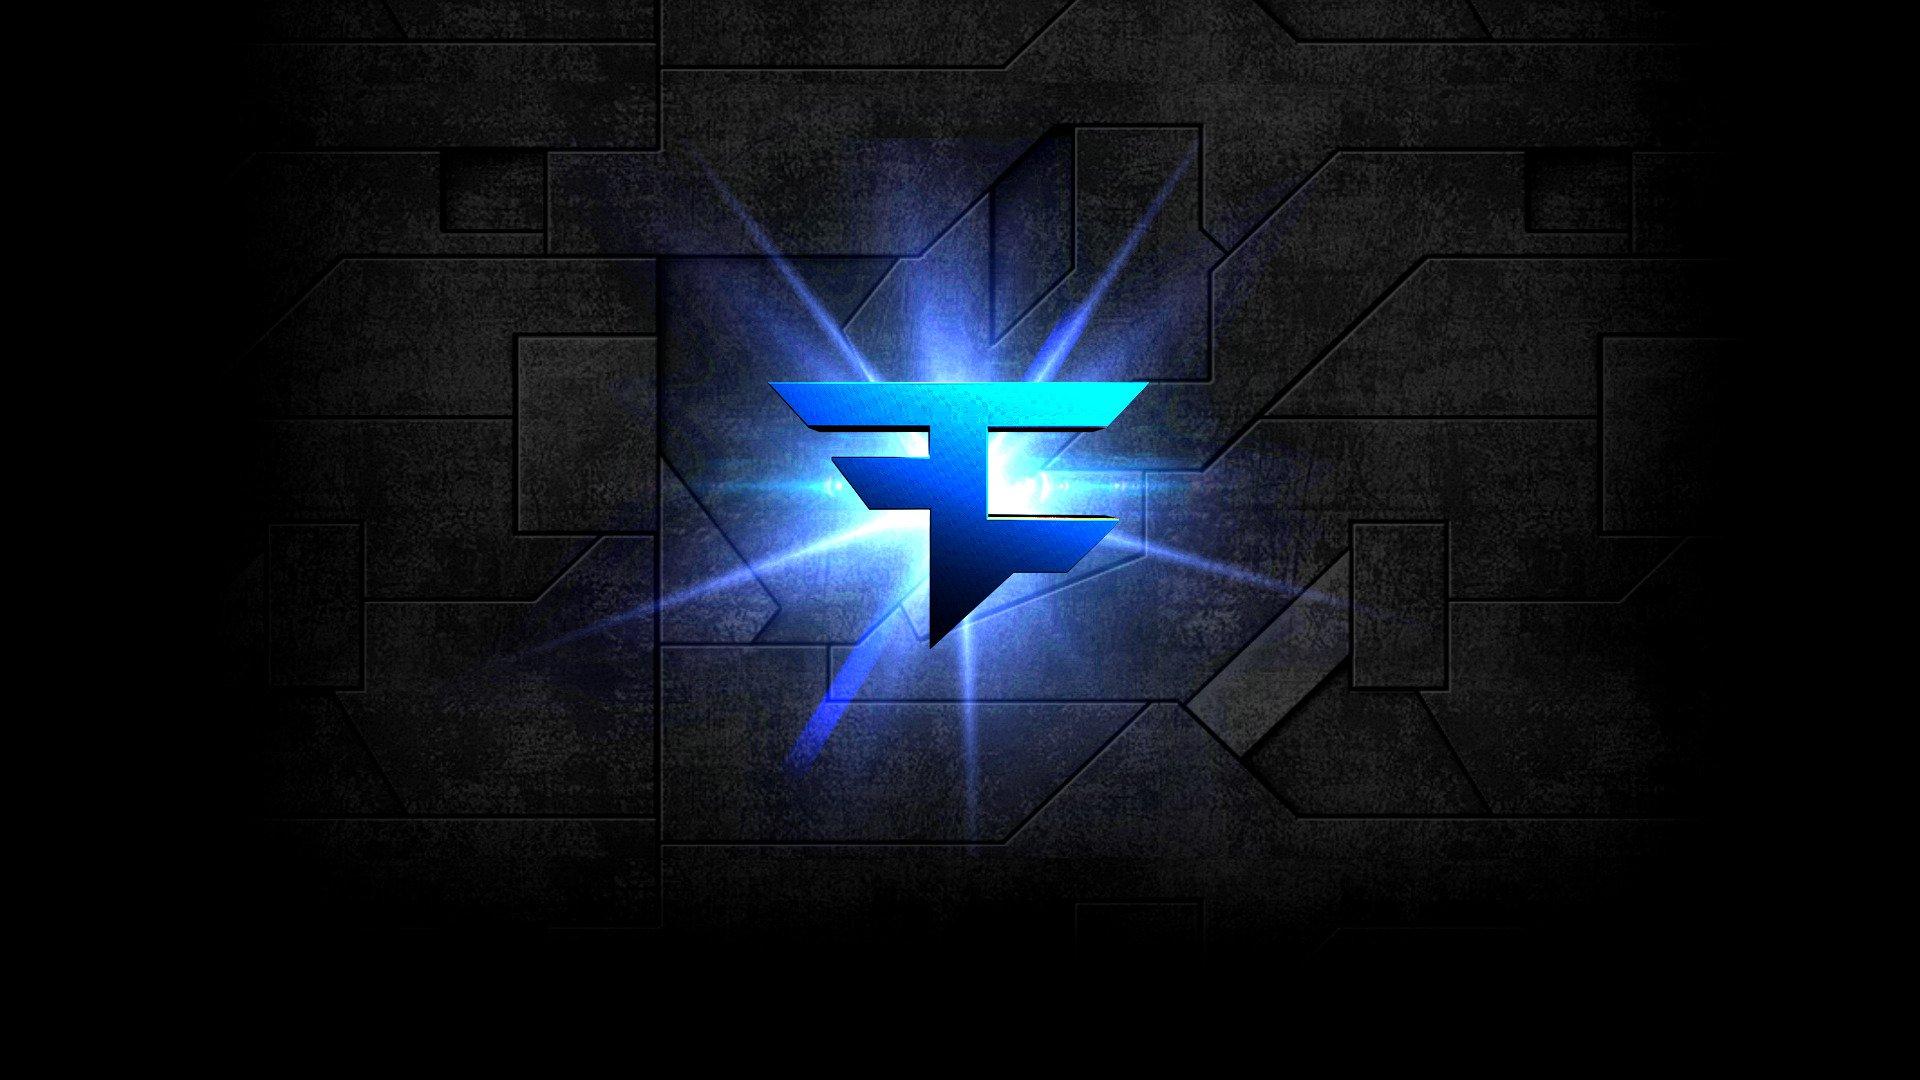 Showing Gallery For Faze Clan Logo Blue 1920x1080